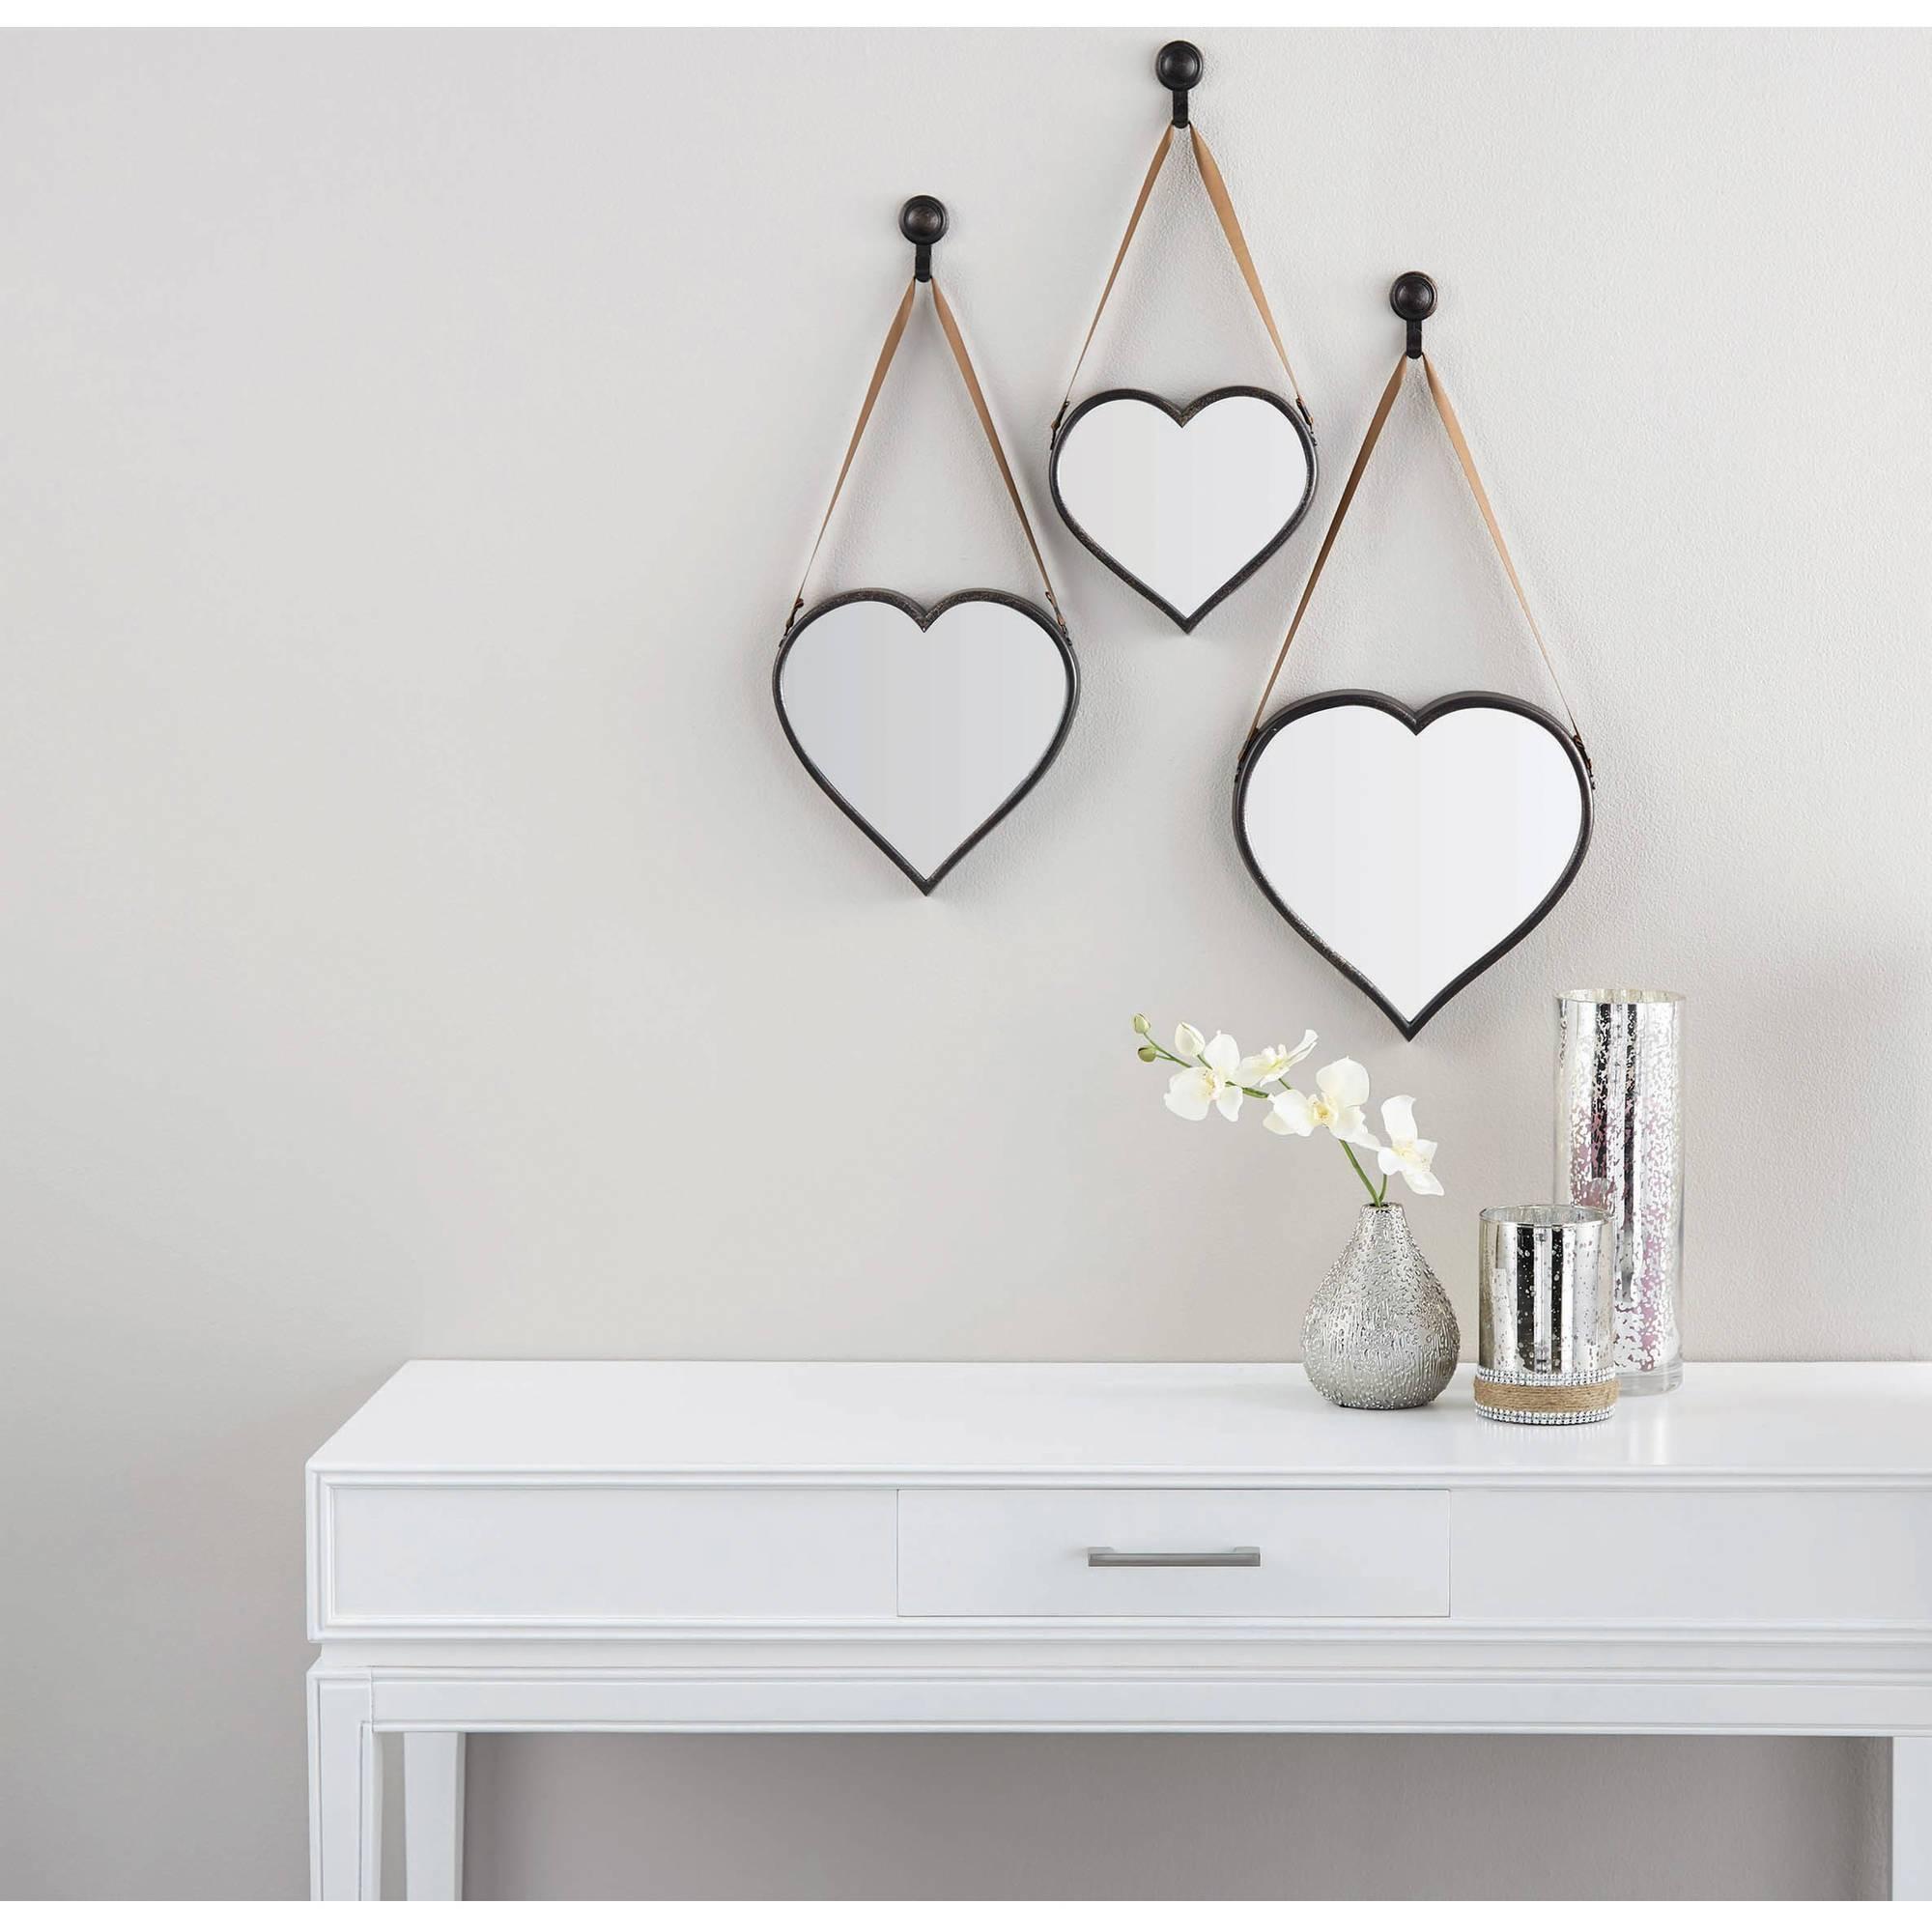 Mainstays 3-Piece Heart Mirror Set - Walmart in Heart Wall Mirrors (Image 17 of 25)